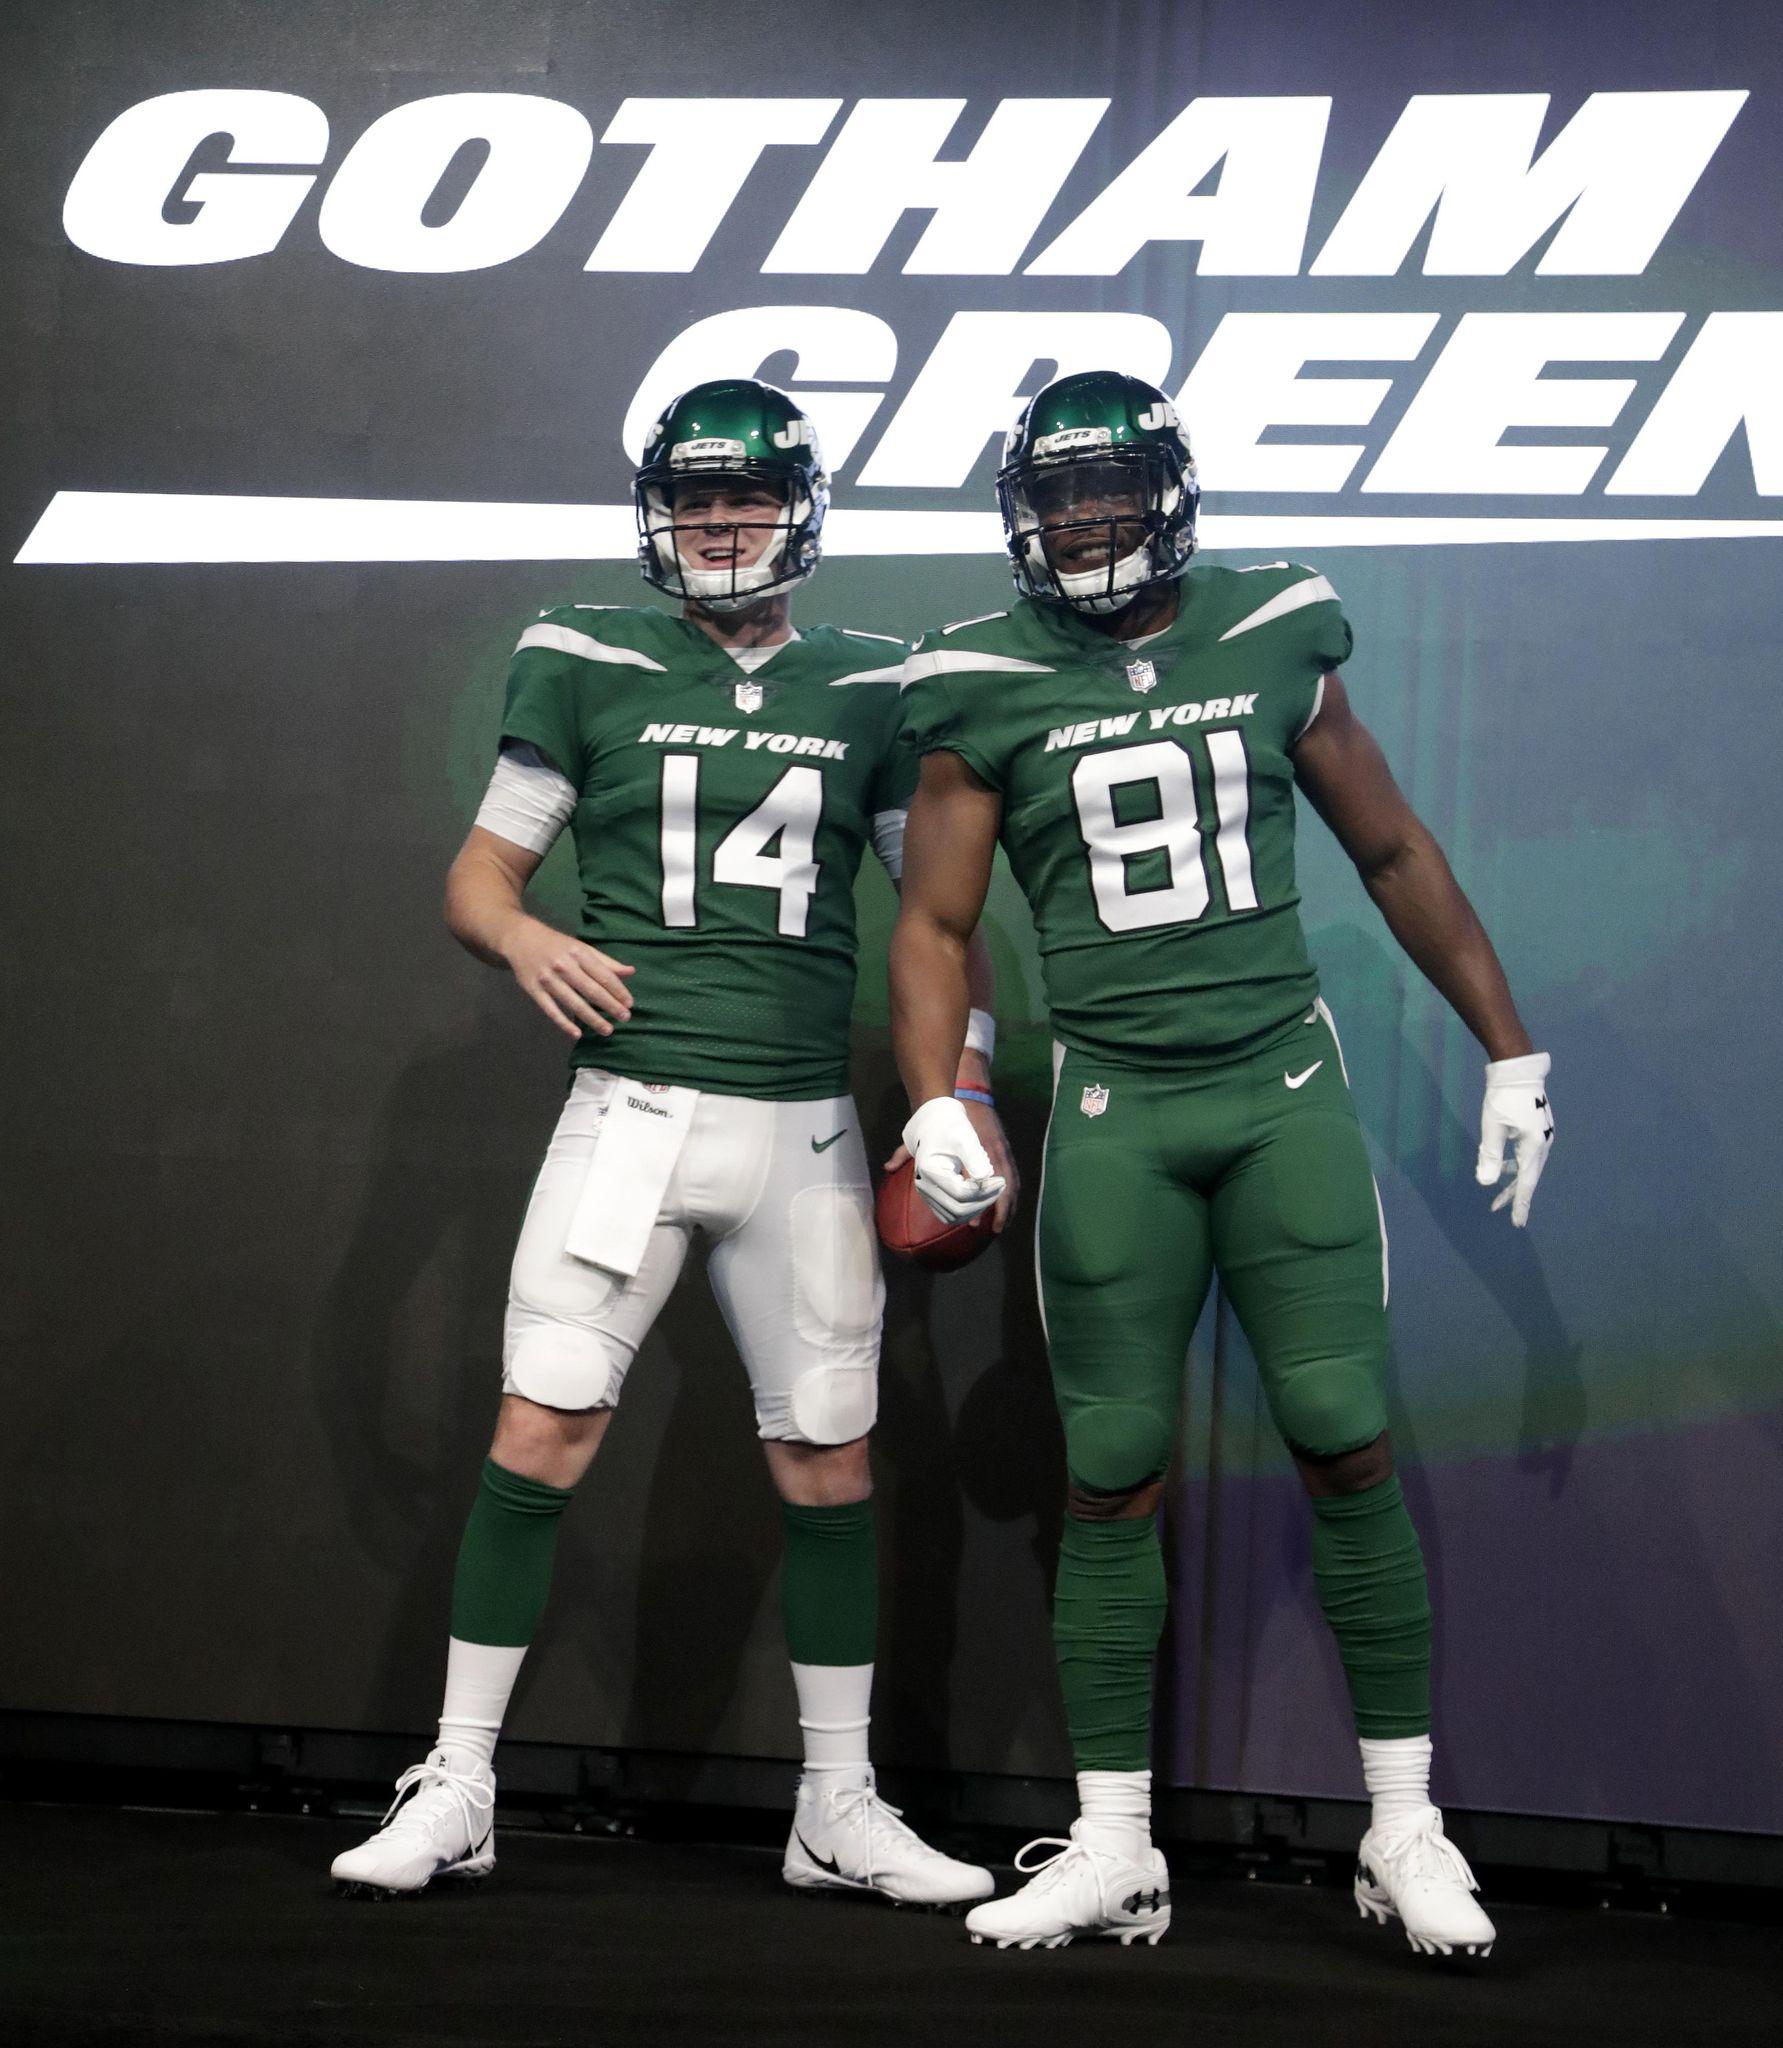 Jets_new_uniforms_football_59664_s1783x2048